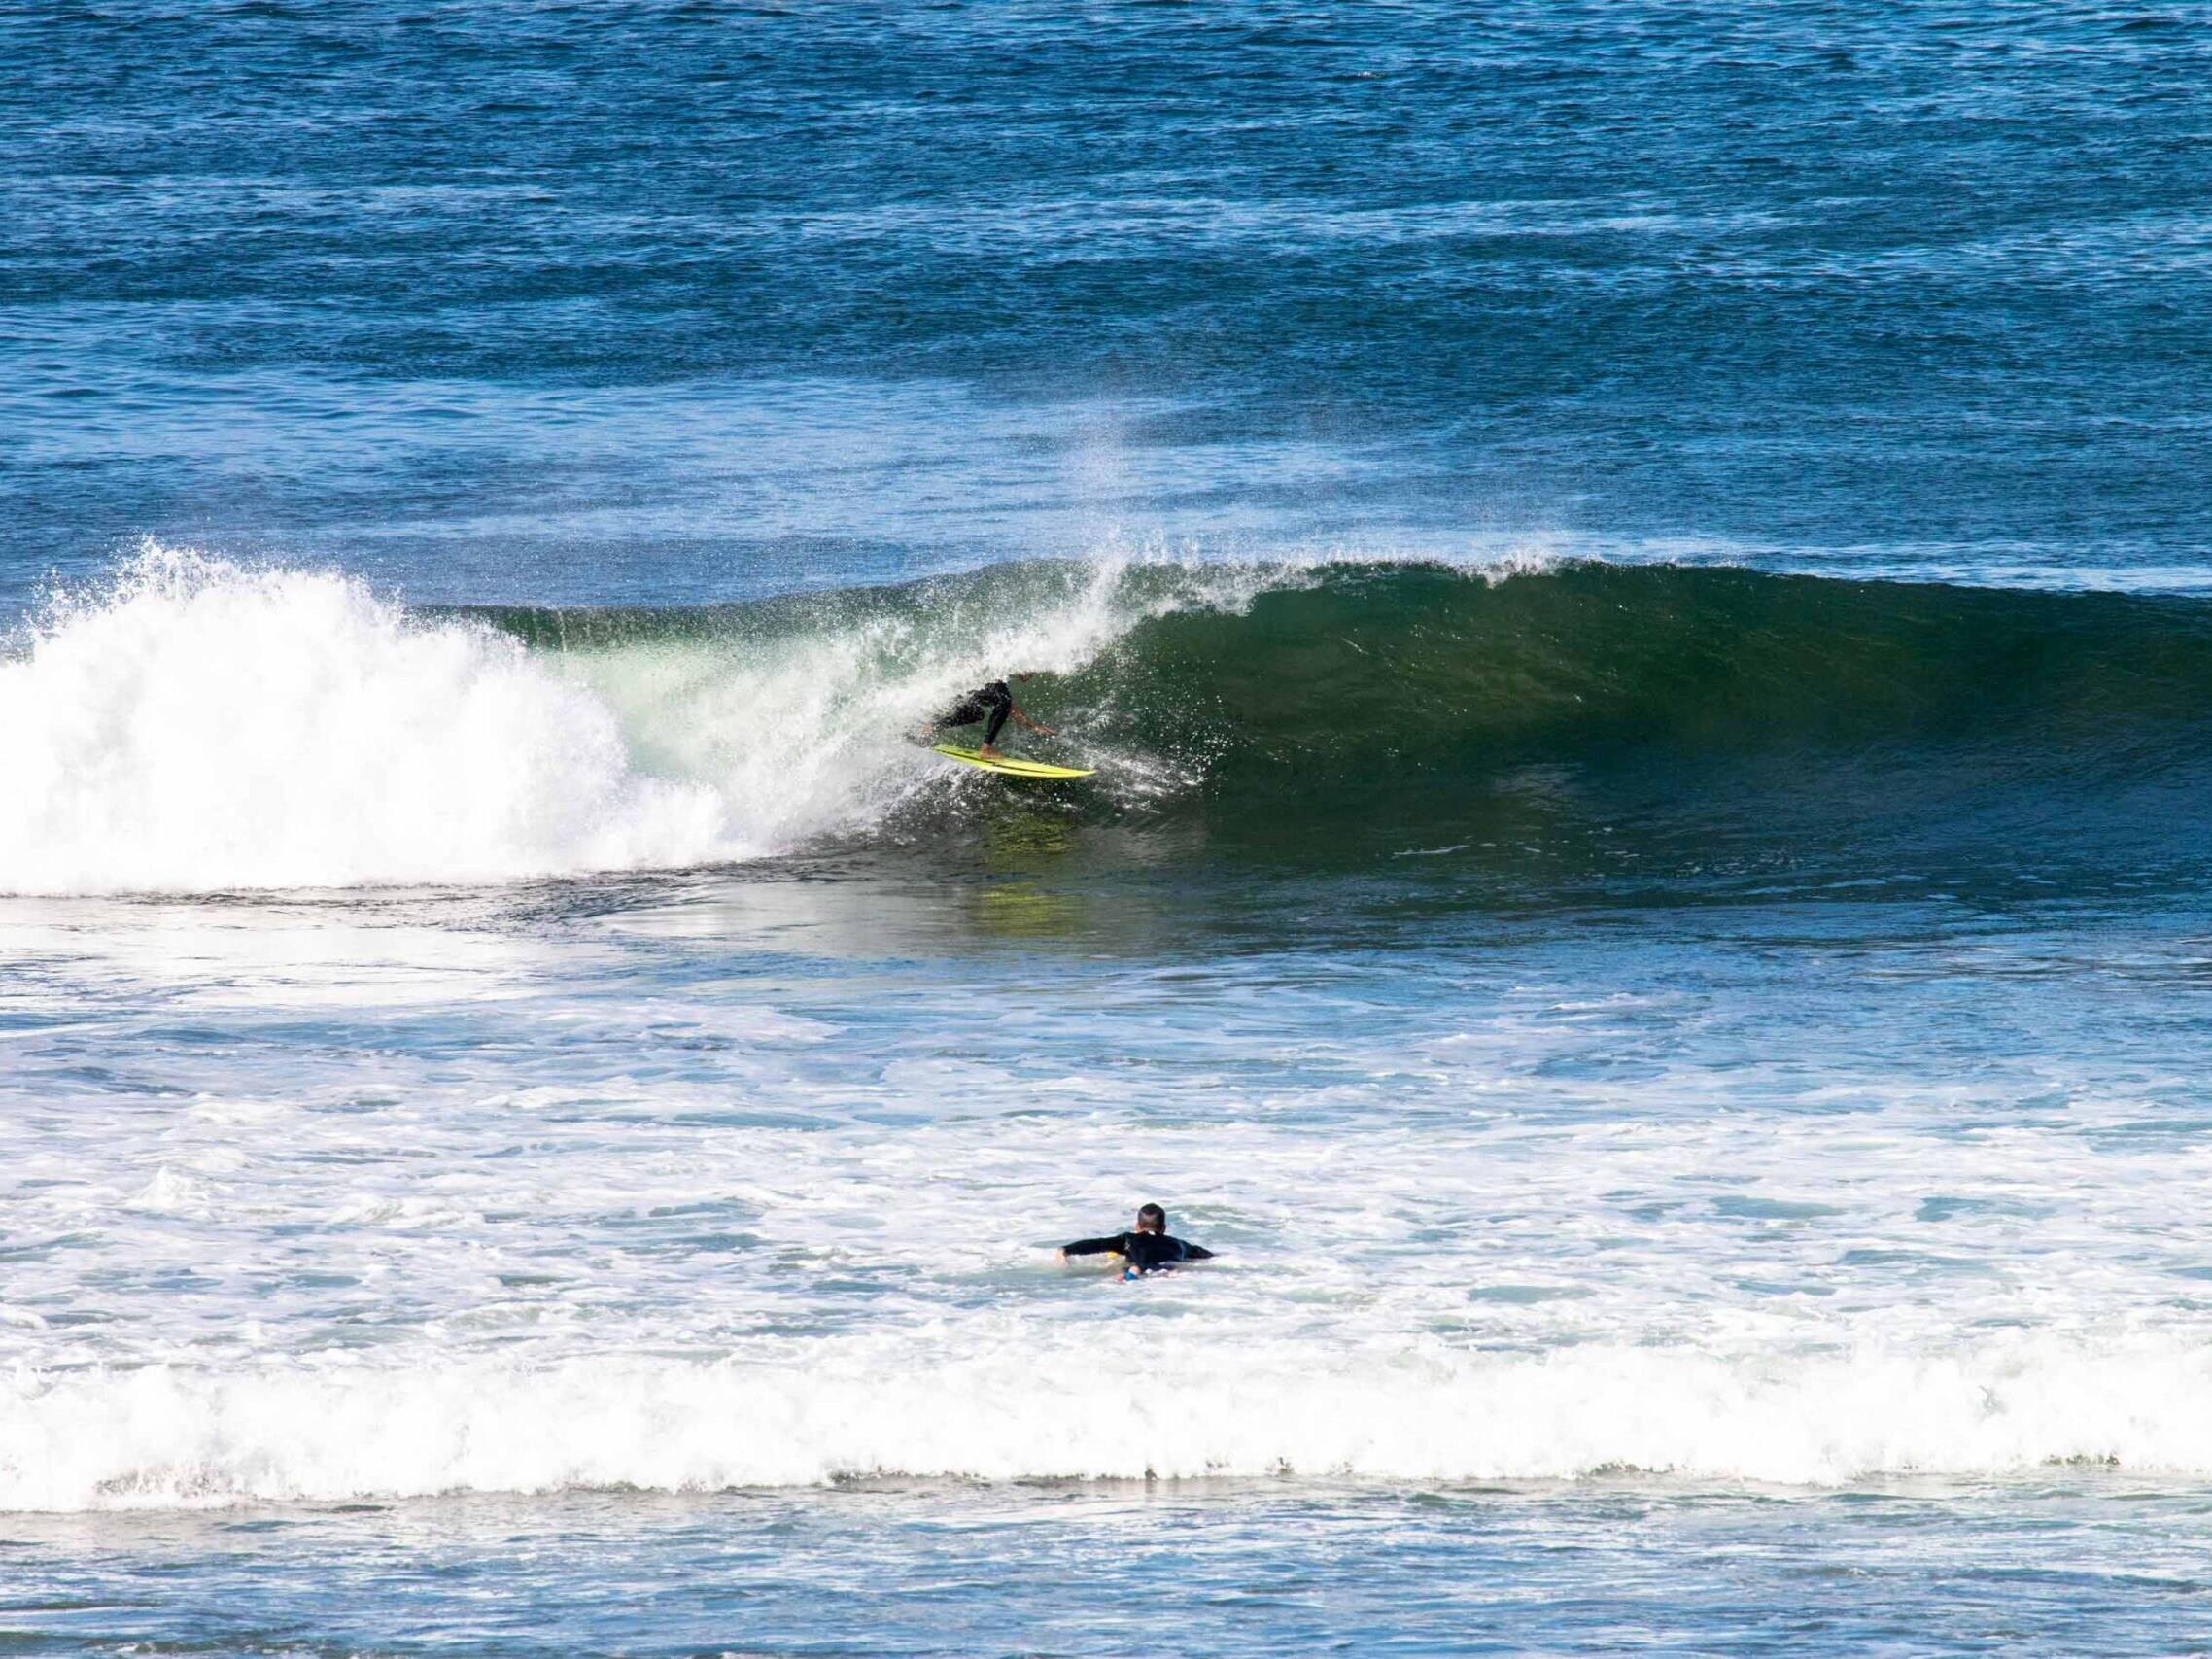 Barrel wave at Playa Colorado Nicaragua